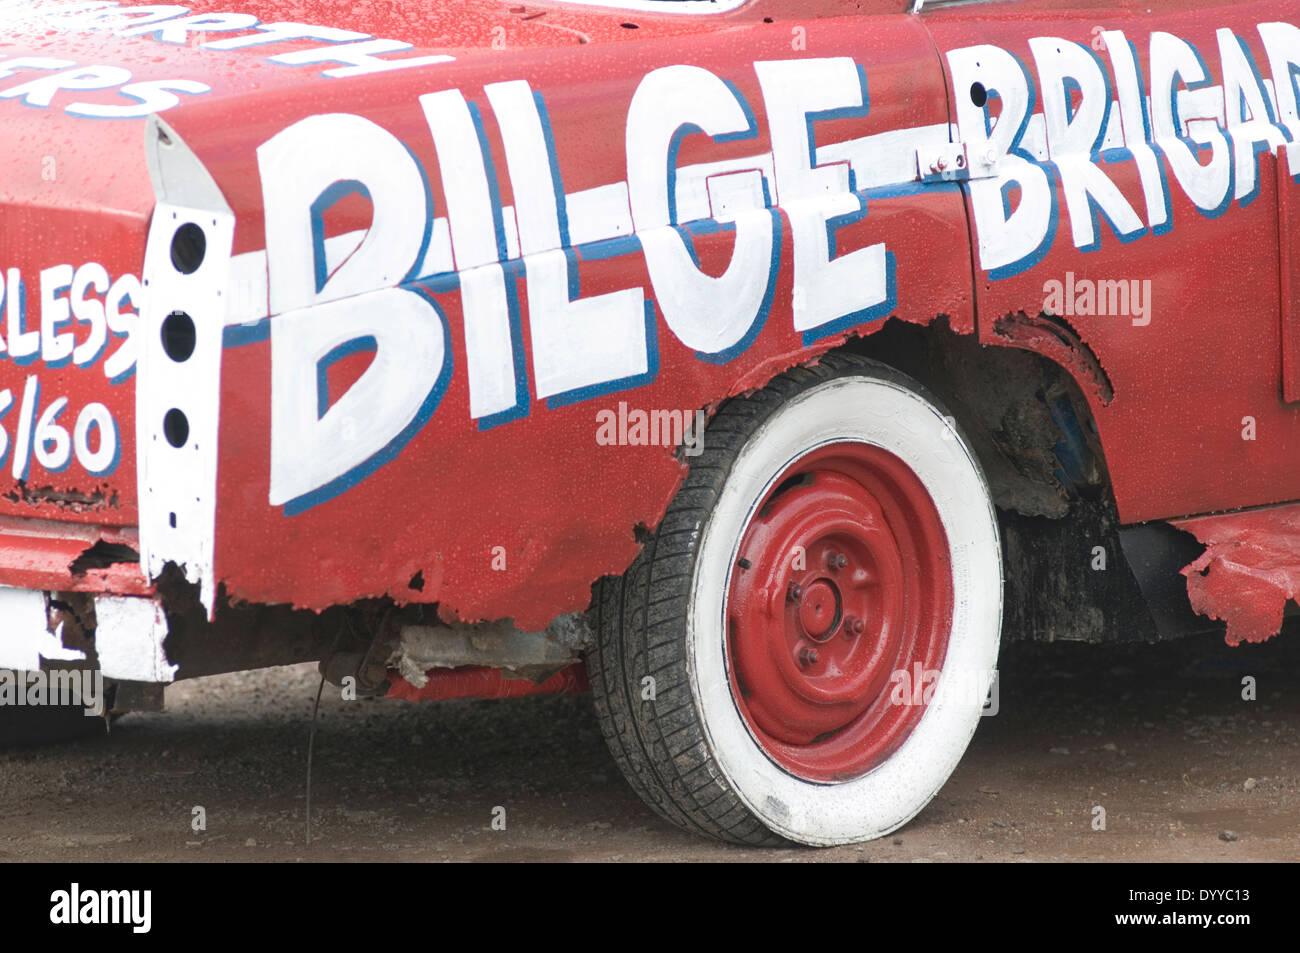 banger racing race races demolition derby destruction derby car cars old junk scrap rust rusty - Stock Image